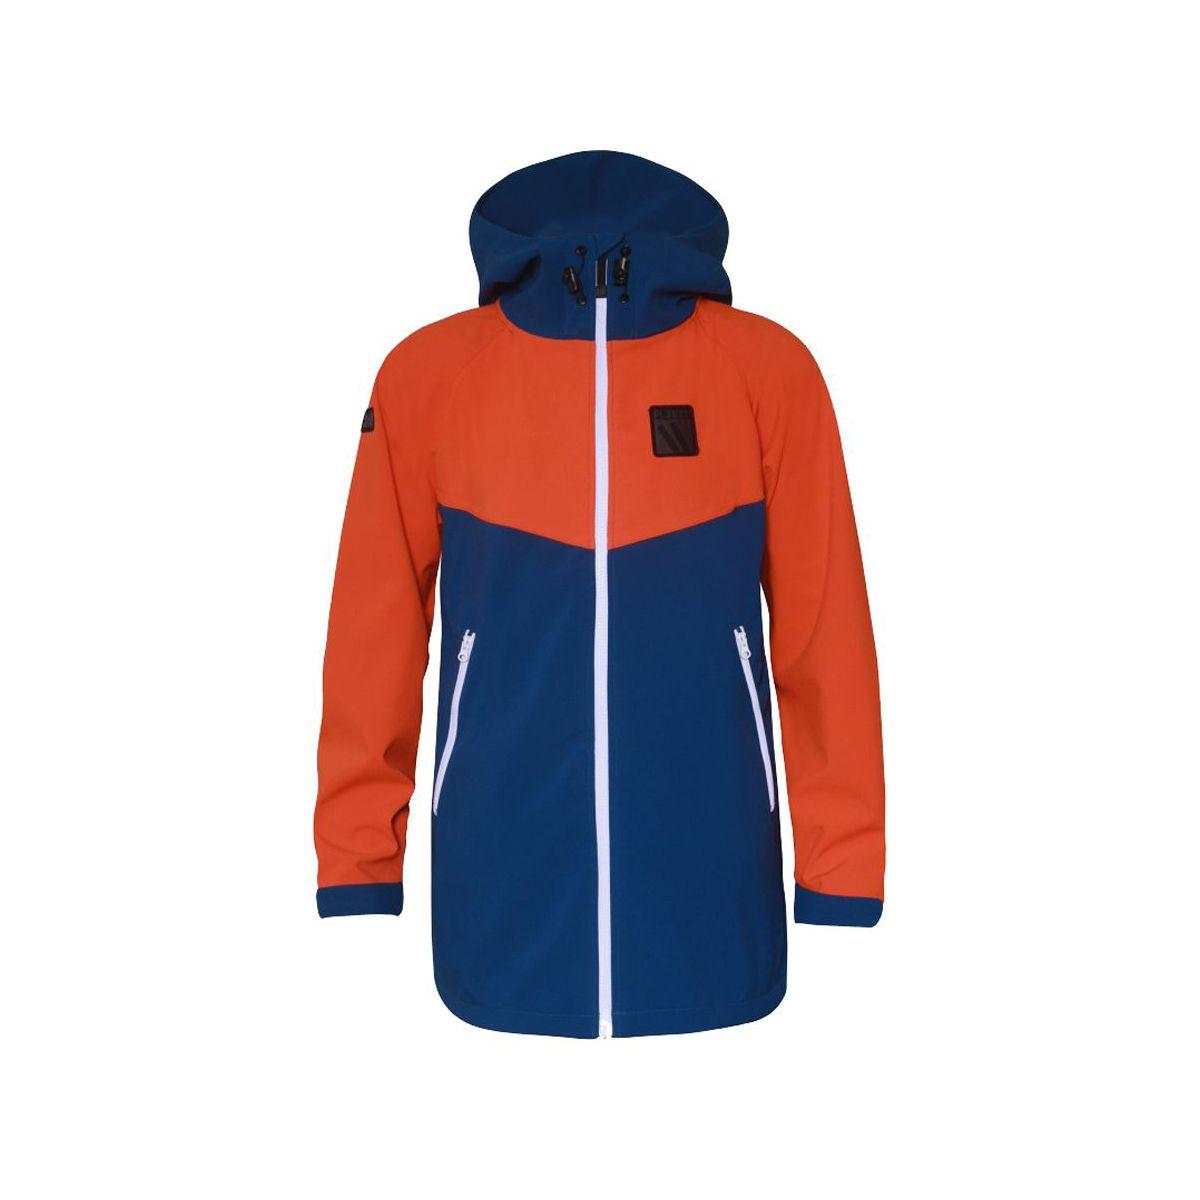 Planks Clothing Bomb Shell-Ter Softshell Jacket - Men